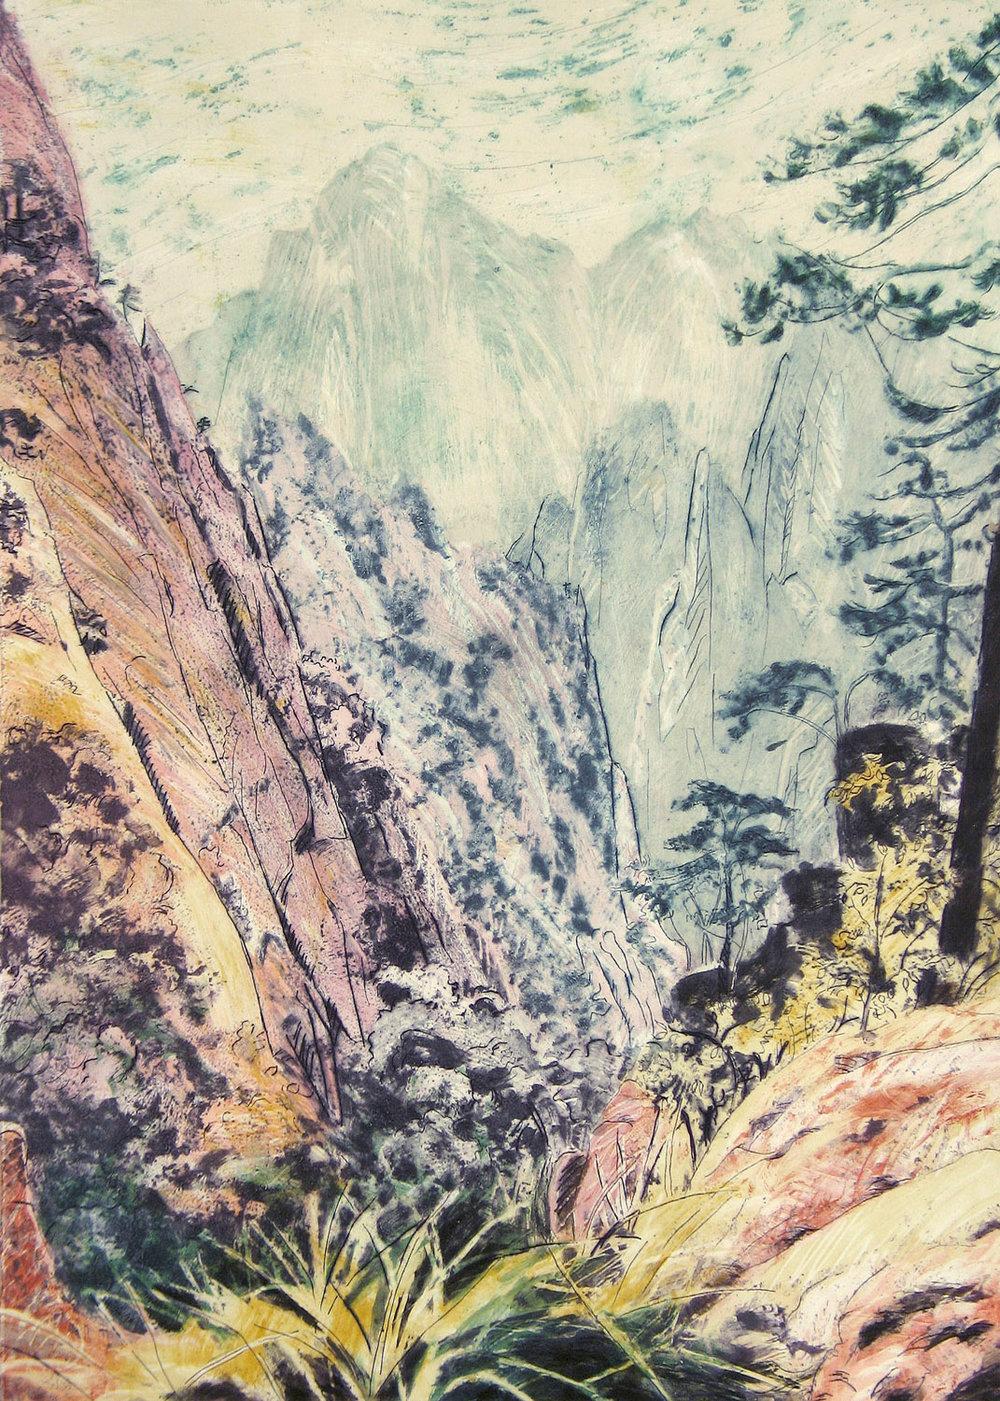 Magical Visions: Huangshang #18